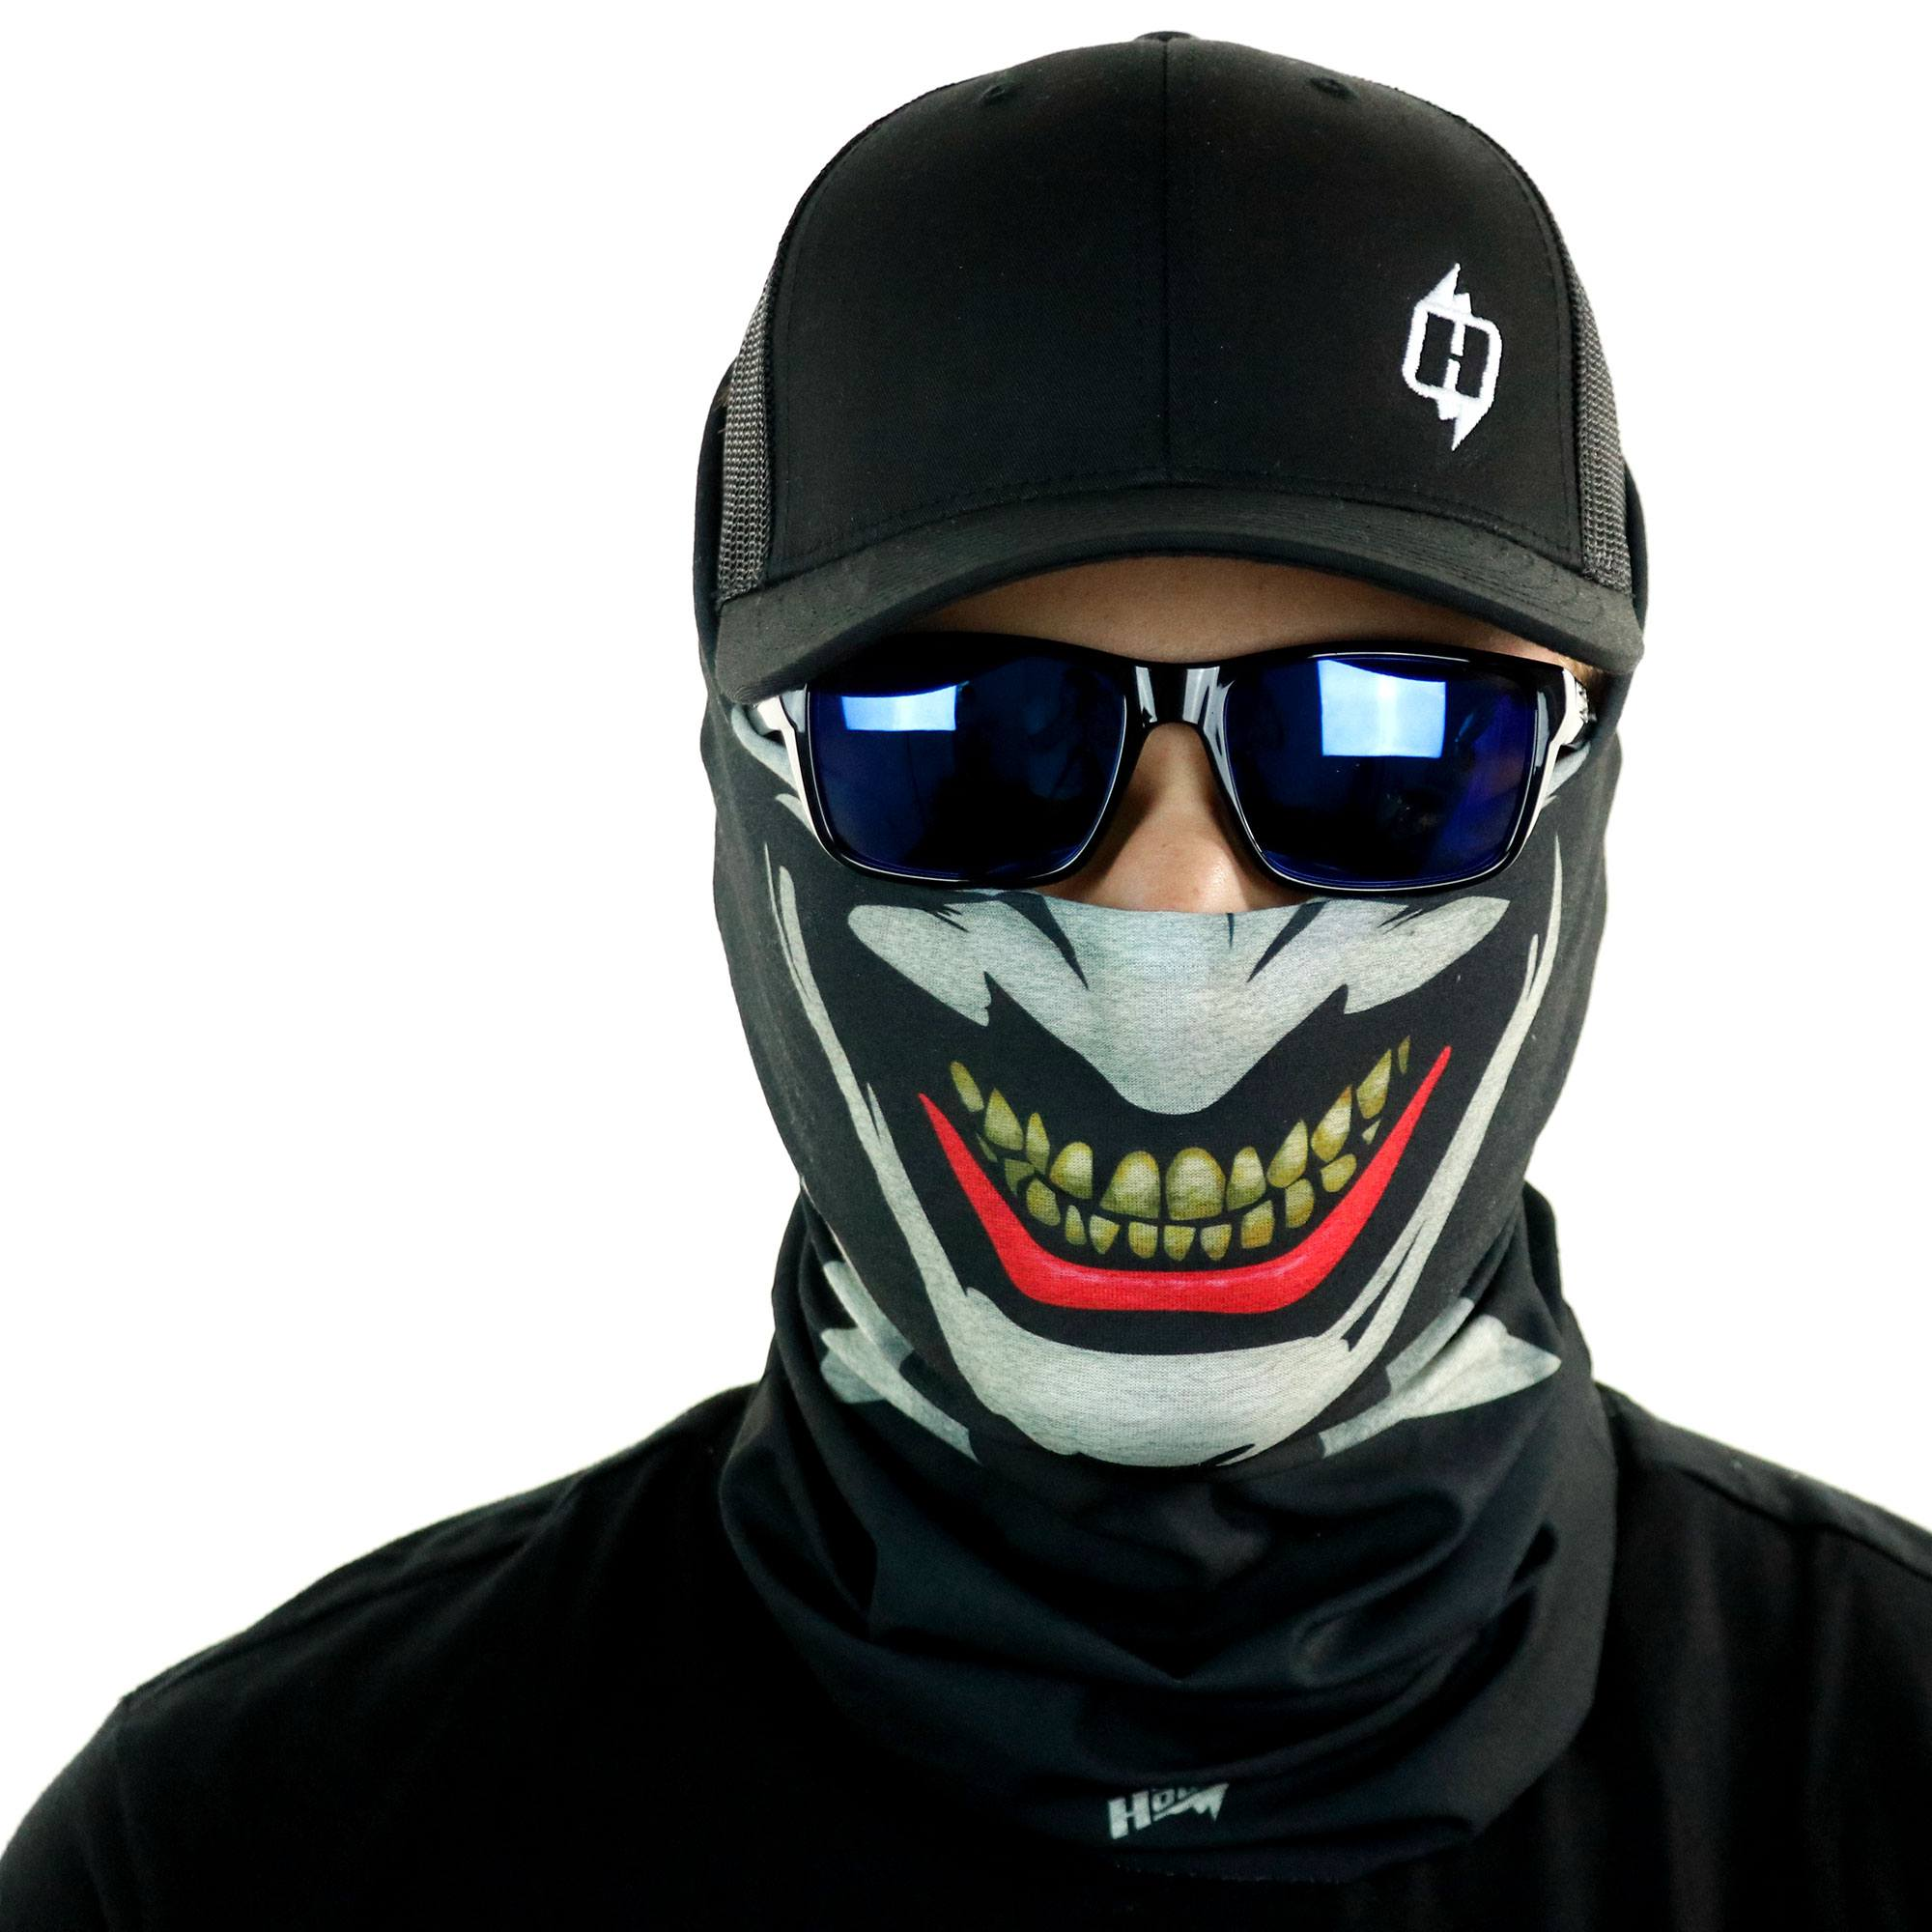 hoorag-face-mask-the-wisecracker